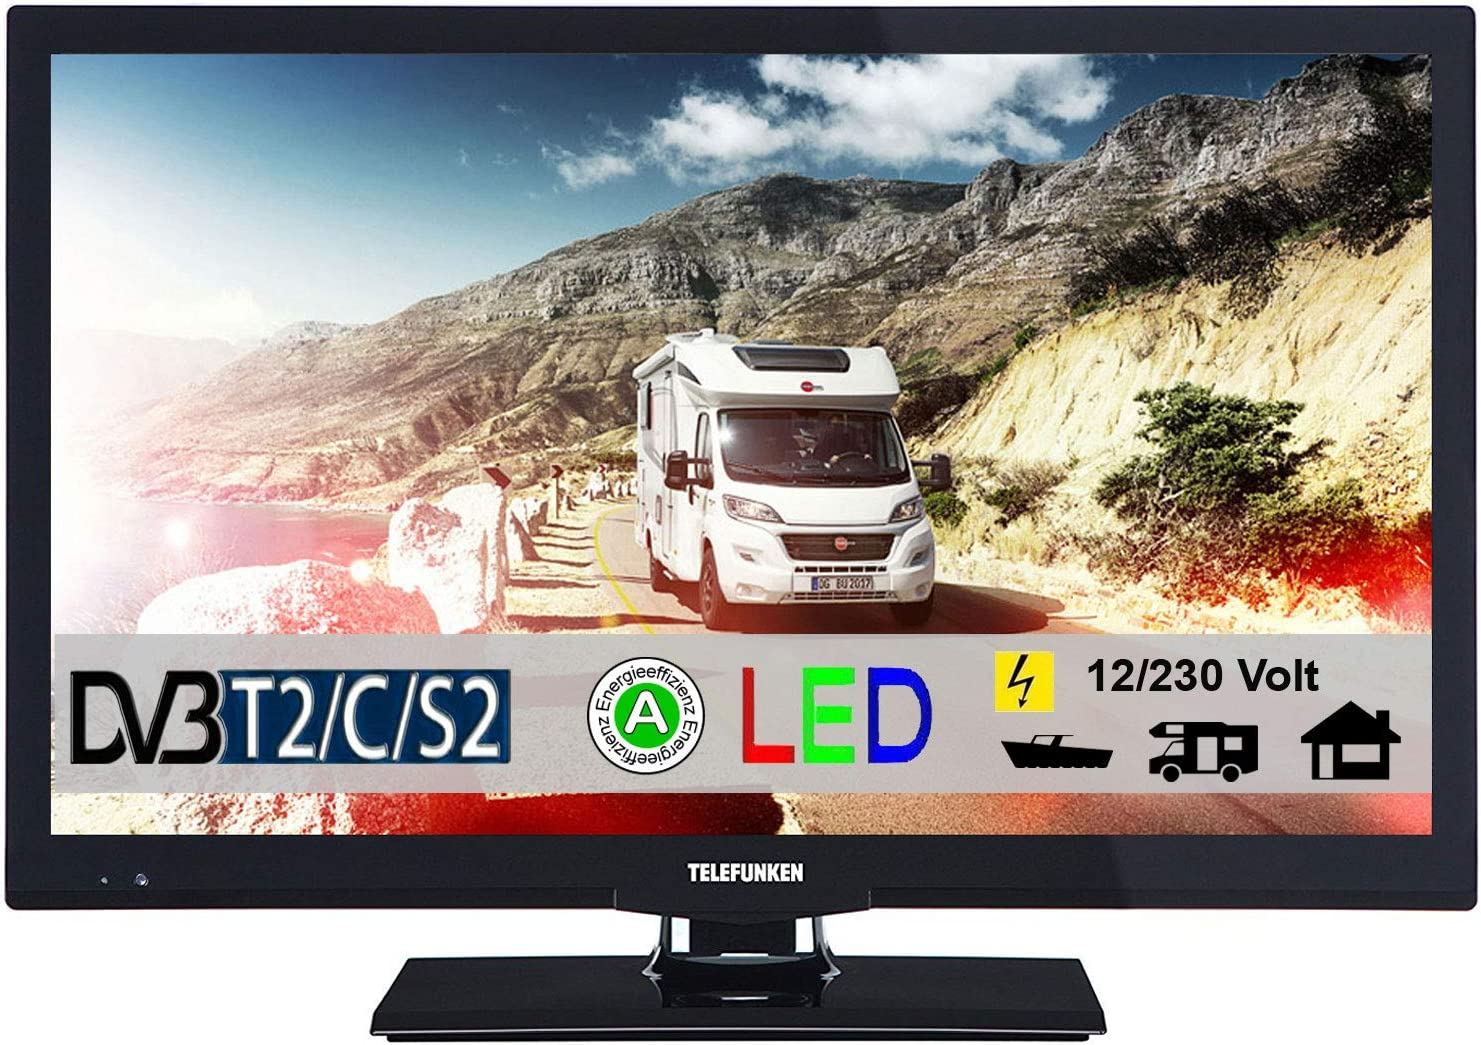 Telefunken T22 X 720 Móvil LED TV de 22 Pulgadas DVB-T/S/S2/T/T2/C USB 12 V 230 V Caravana Camping Coche camión Truck y Casa